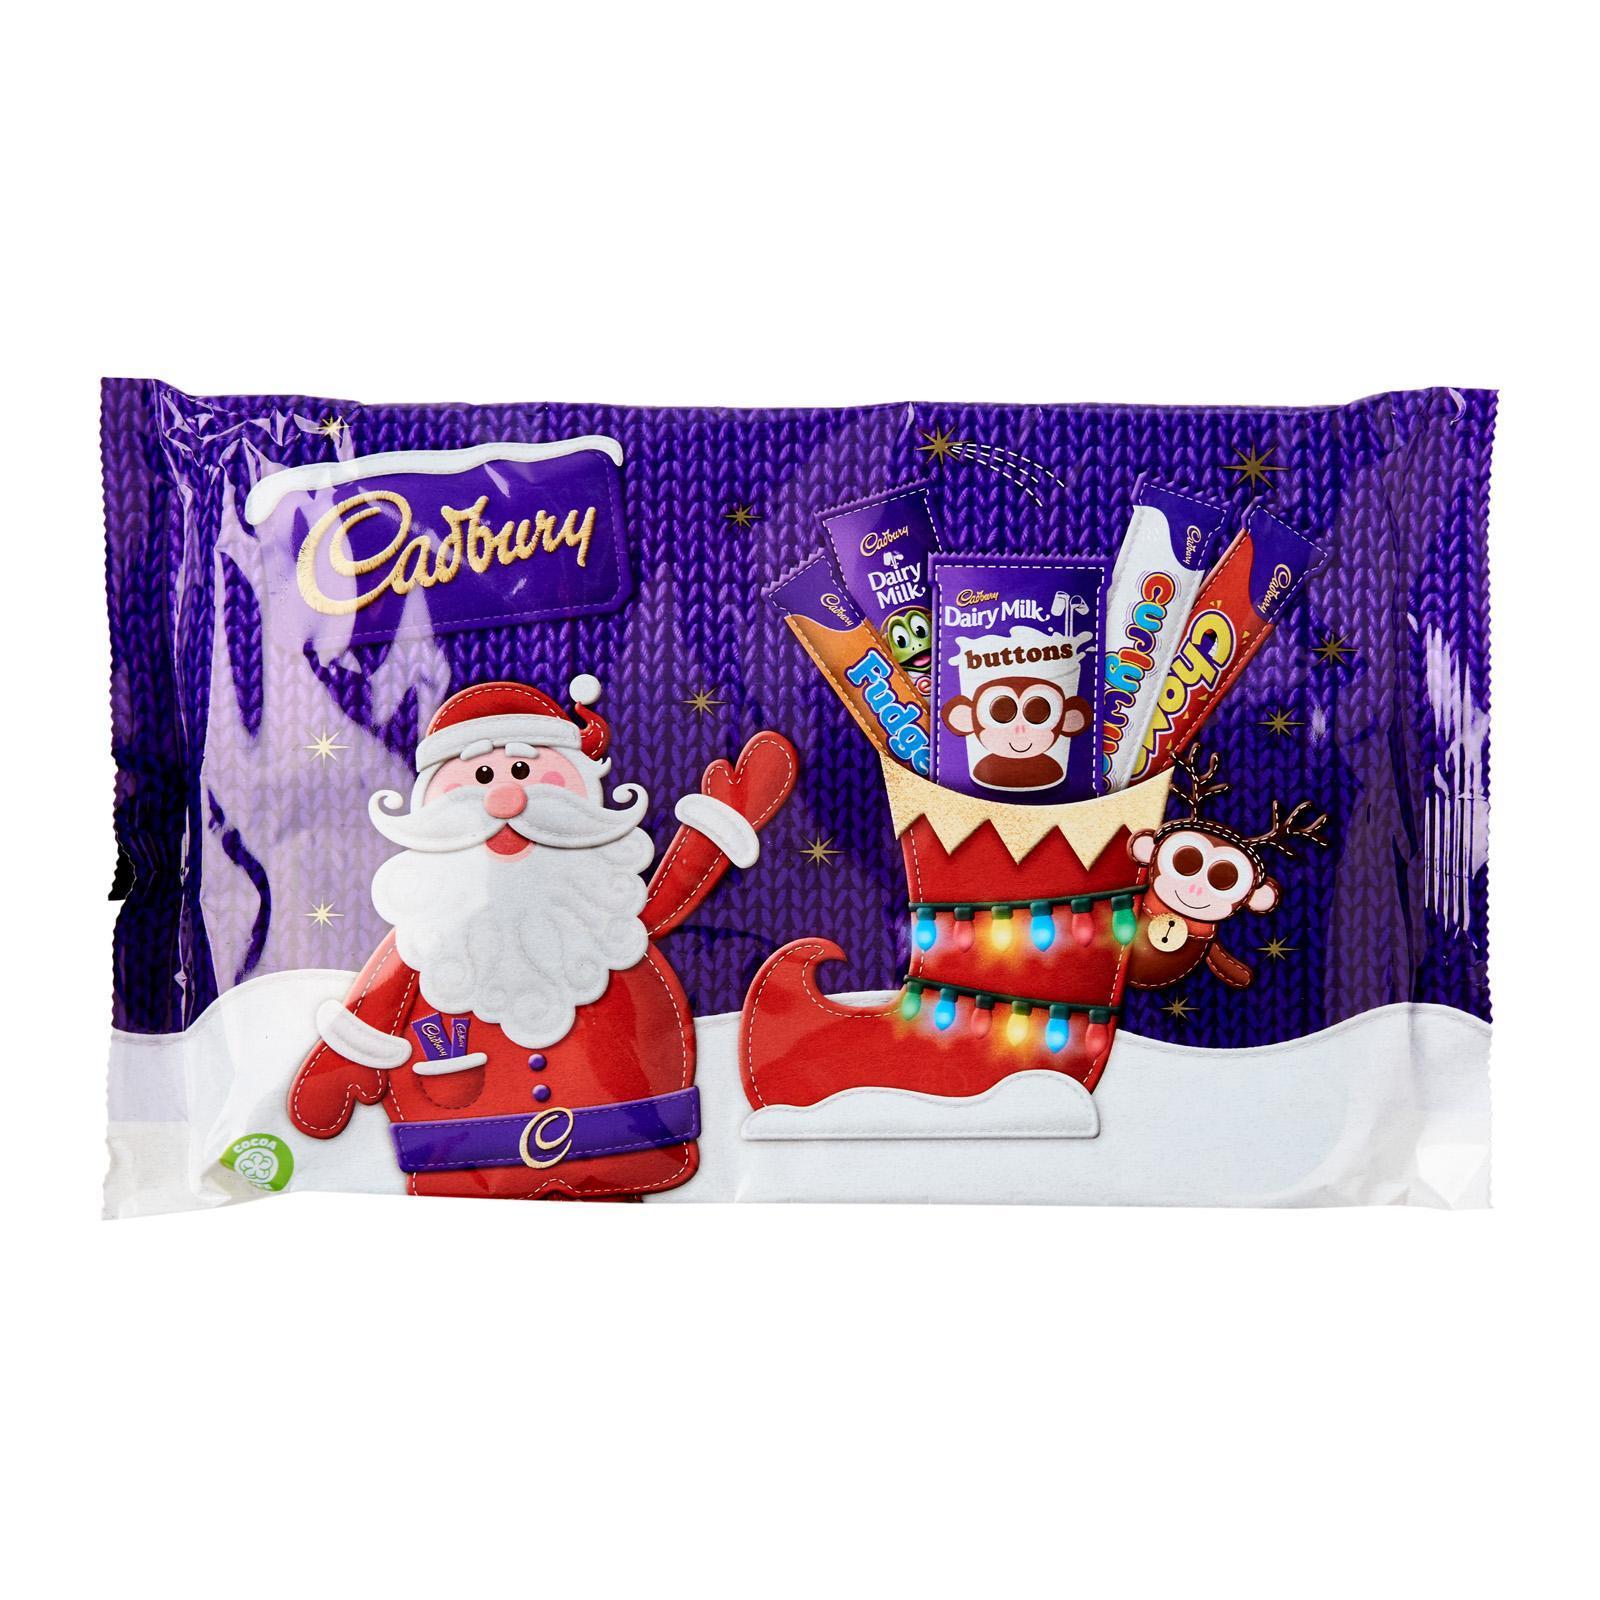 Cadbury Small Selection Chocolate Pack - Christmas Special